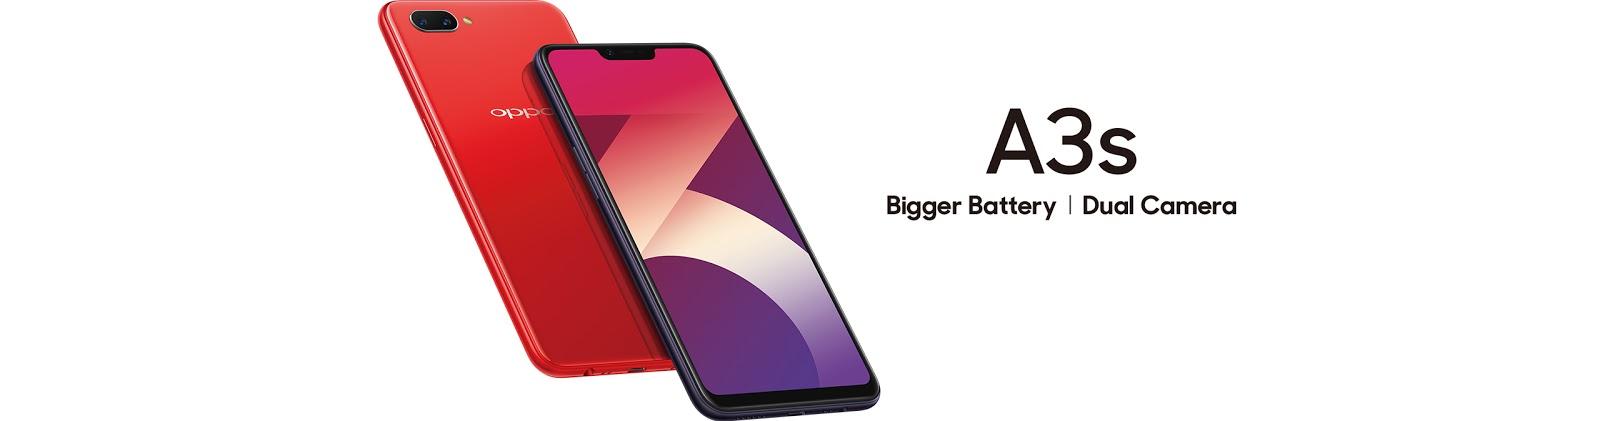 Smartphone Baru 2018 Oppo A3s Baterai Besar Harga 2 Jutaan Elppas